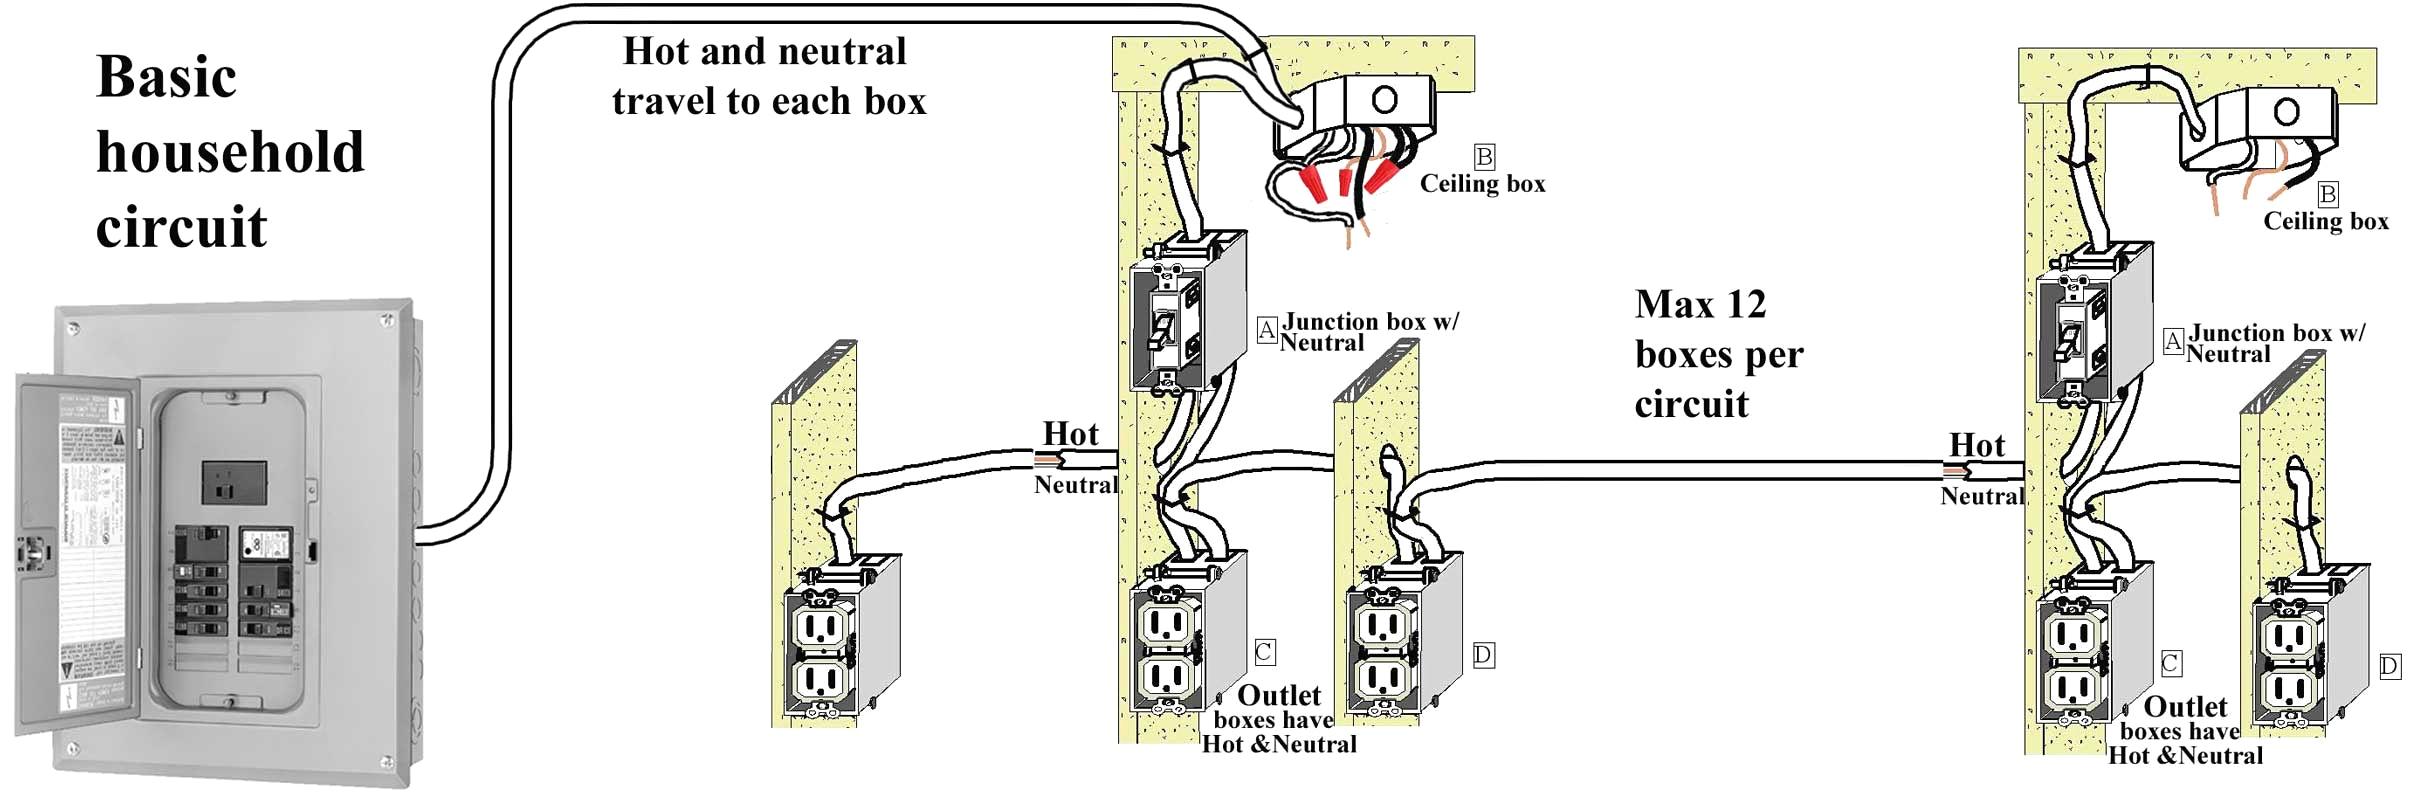 YN_2058] Auto Electrical Wiring Diagram House Electrical Wiring Diagram  Wiring DiagramInki Ologi Cana Greas Hendil Phil Cajos Hendil Mohammedshrine Librar Wiring  101